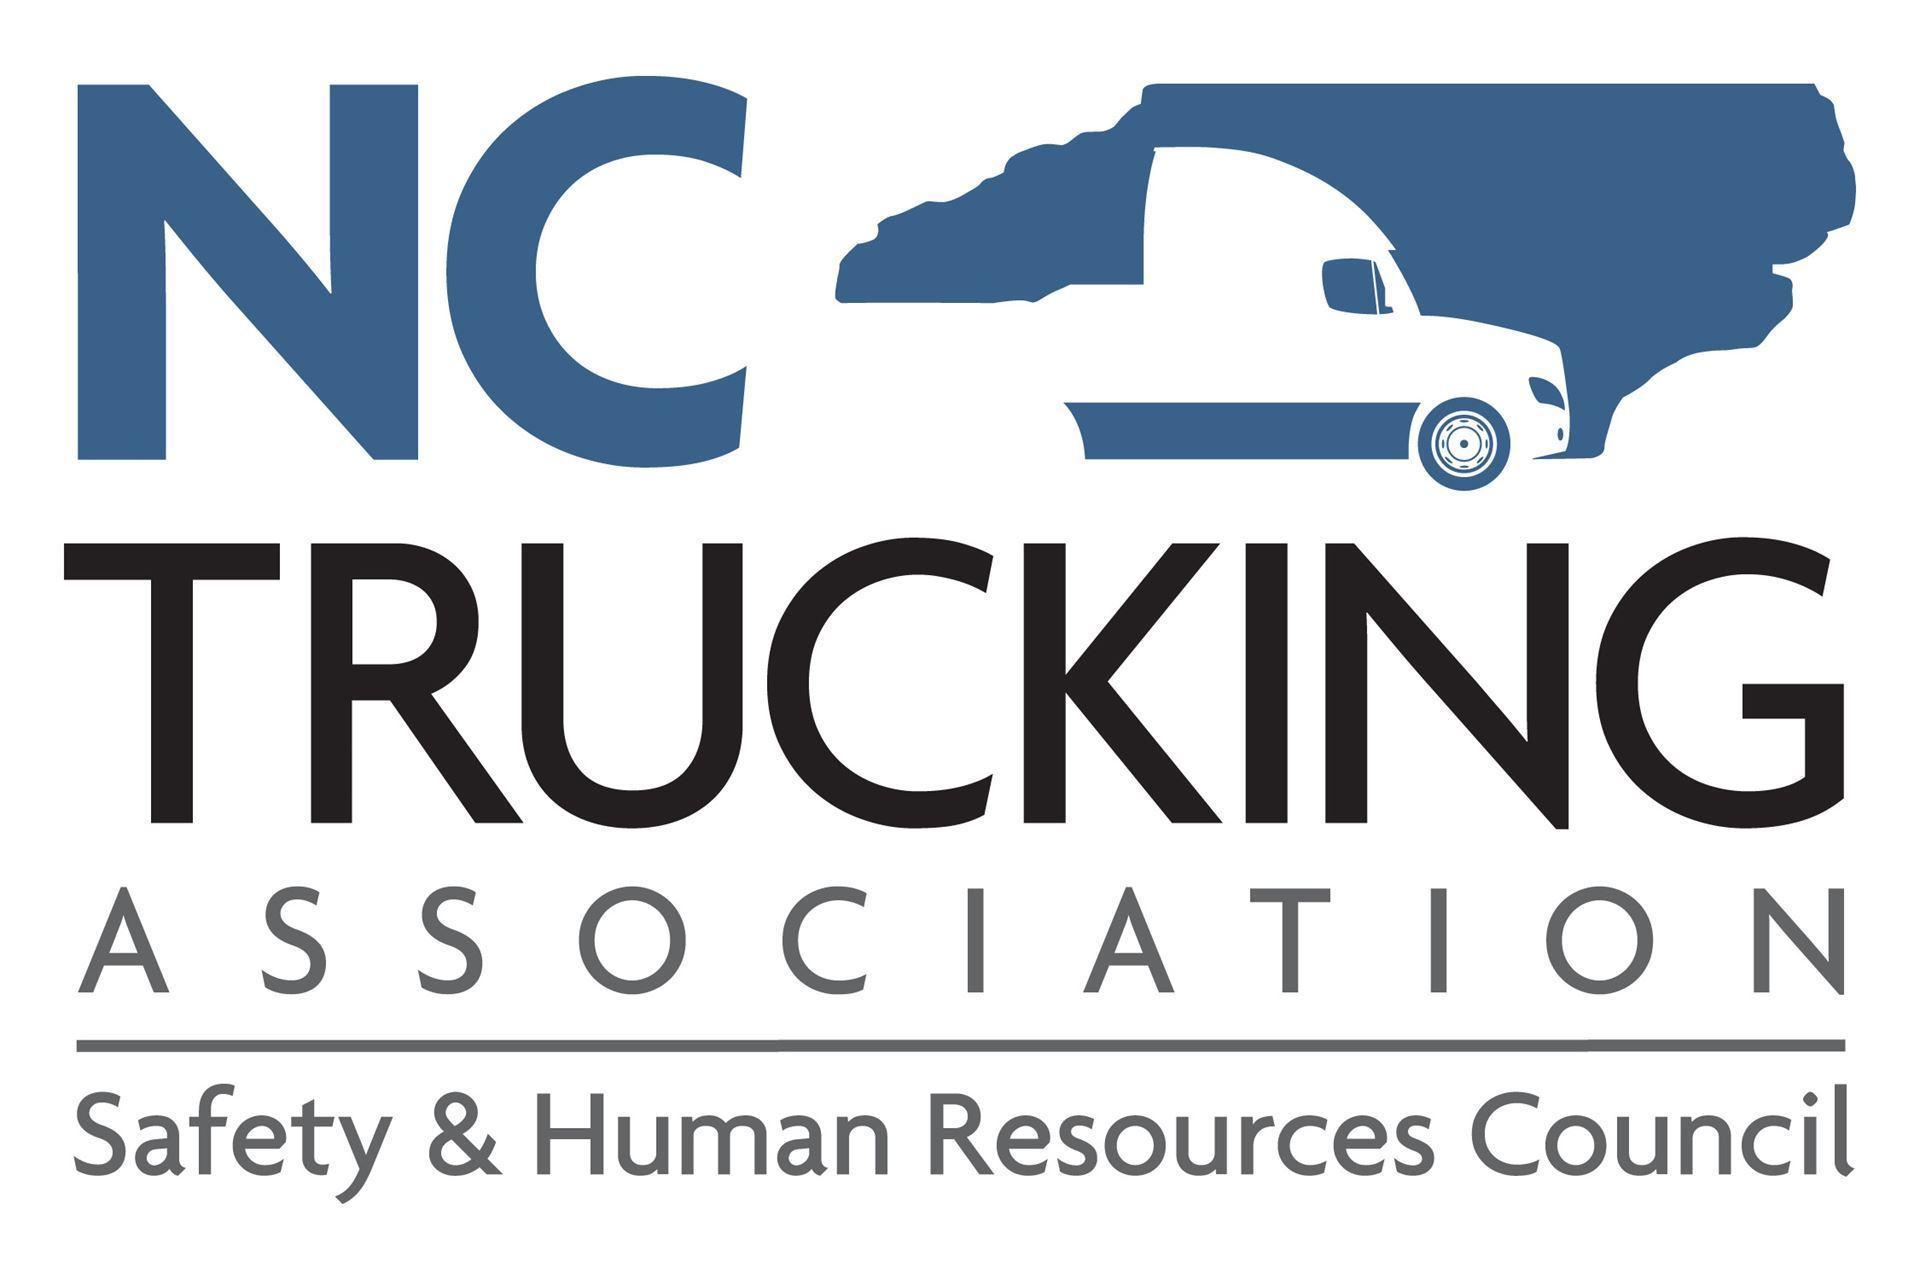 SHRC Meeting: 9/3/20